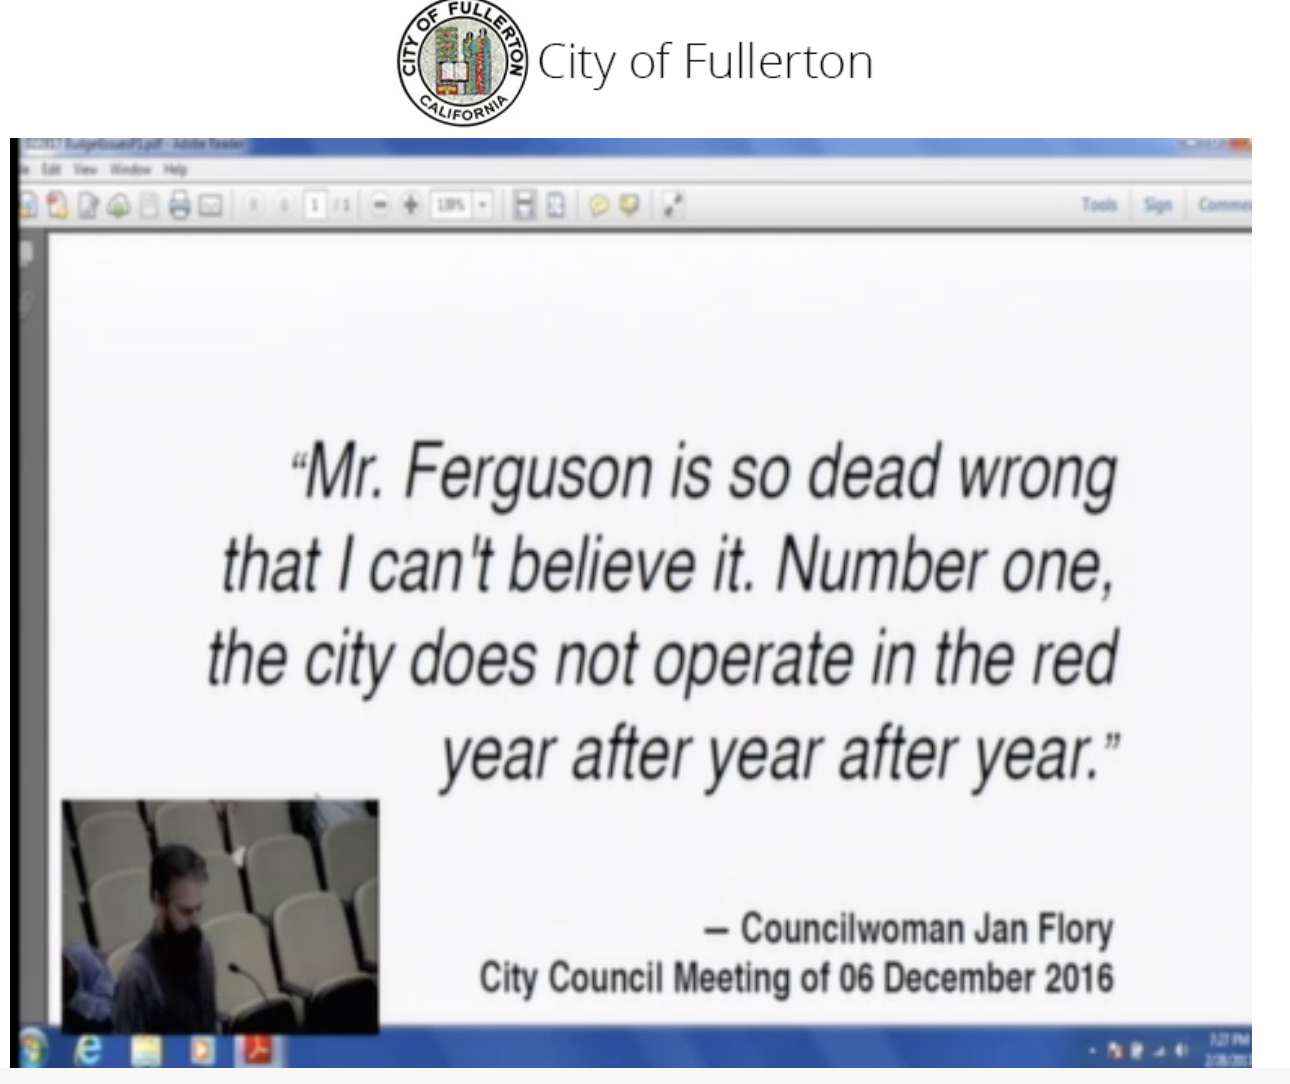 FergusonDeadWrong-Flory